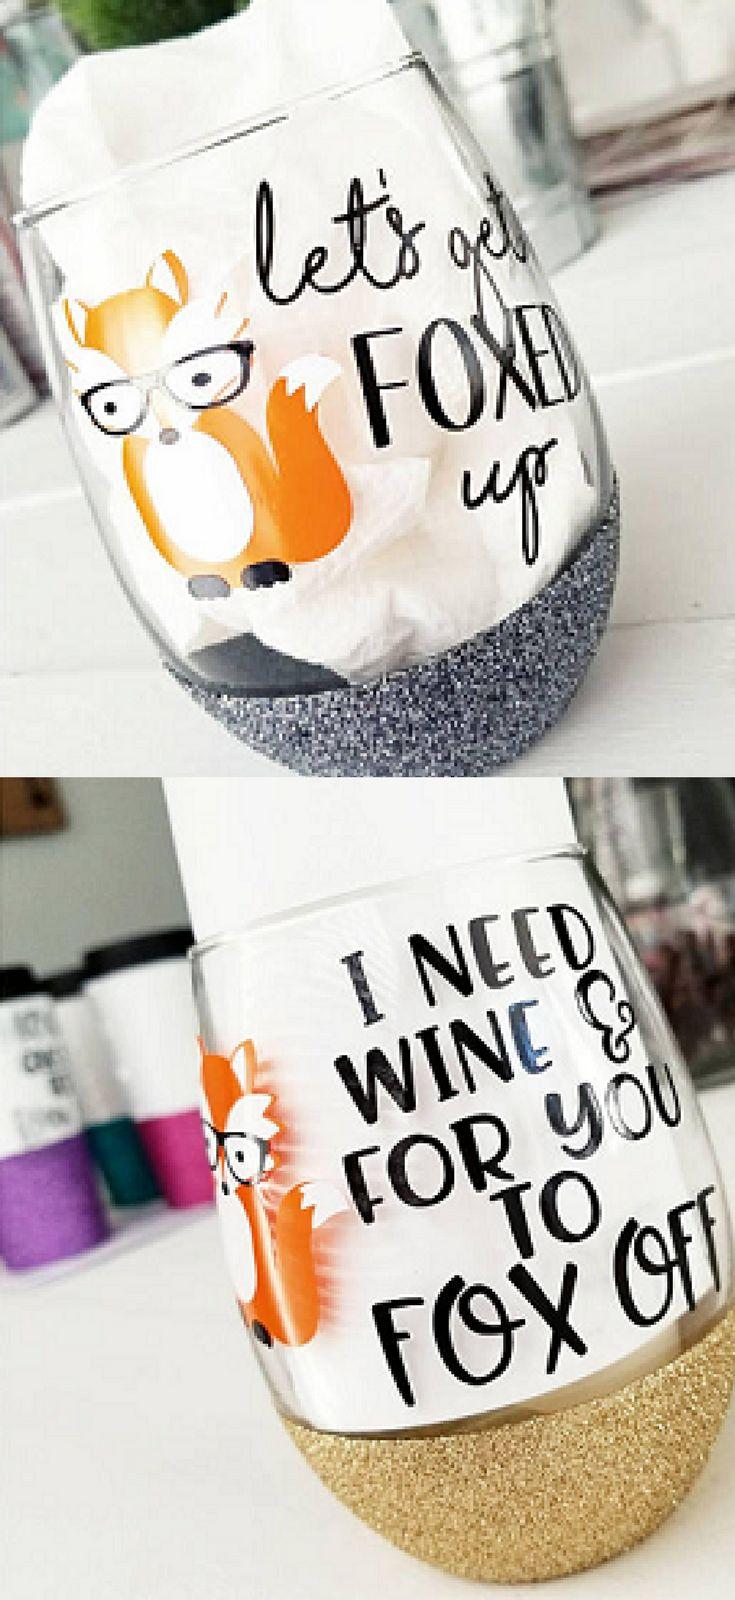 Cute Fox Wine Glasses. Cute mugs, funny mugs, cool mugs, glitter mugs, glitter wine glasses, unique mugs, unique wine glasses, tea glasses, wine glasses, gifts. #mugs #wine #shopping #gifts #commissionlink